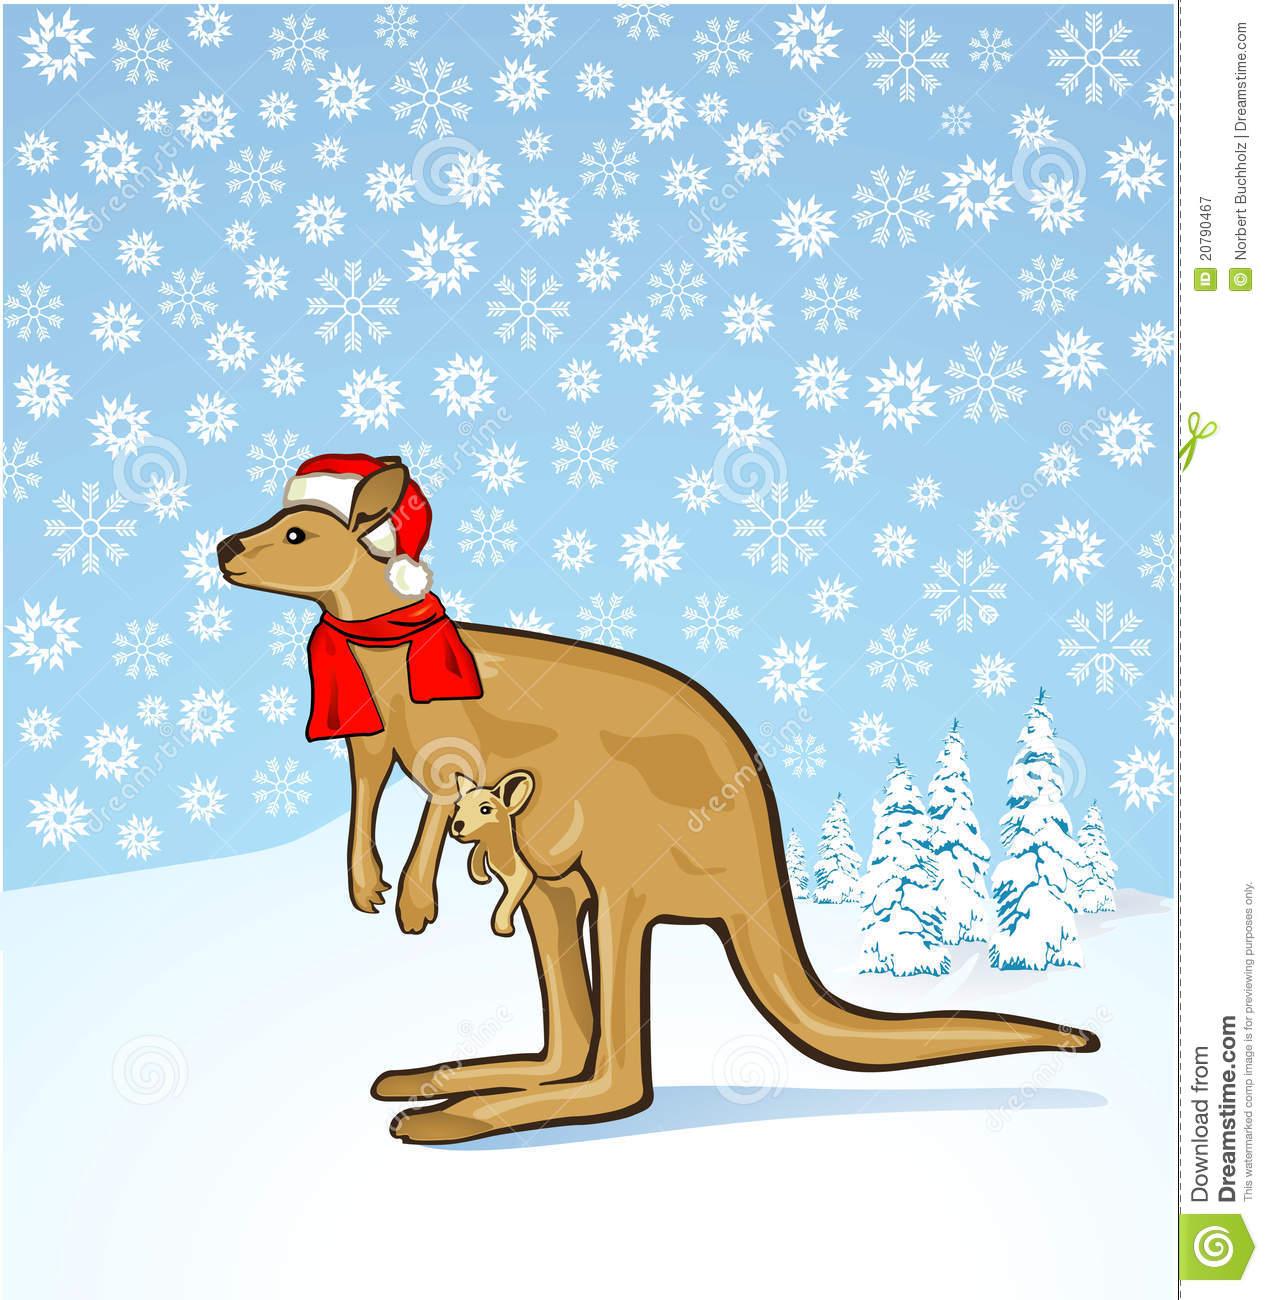 Christmas kangaroo stock vector. Illustration of snowing.